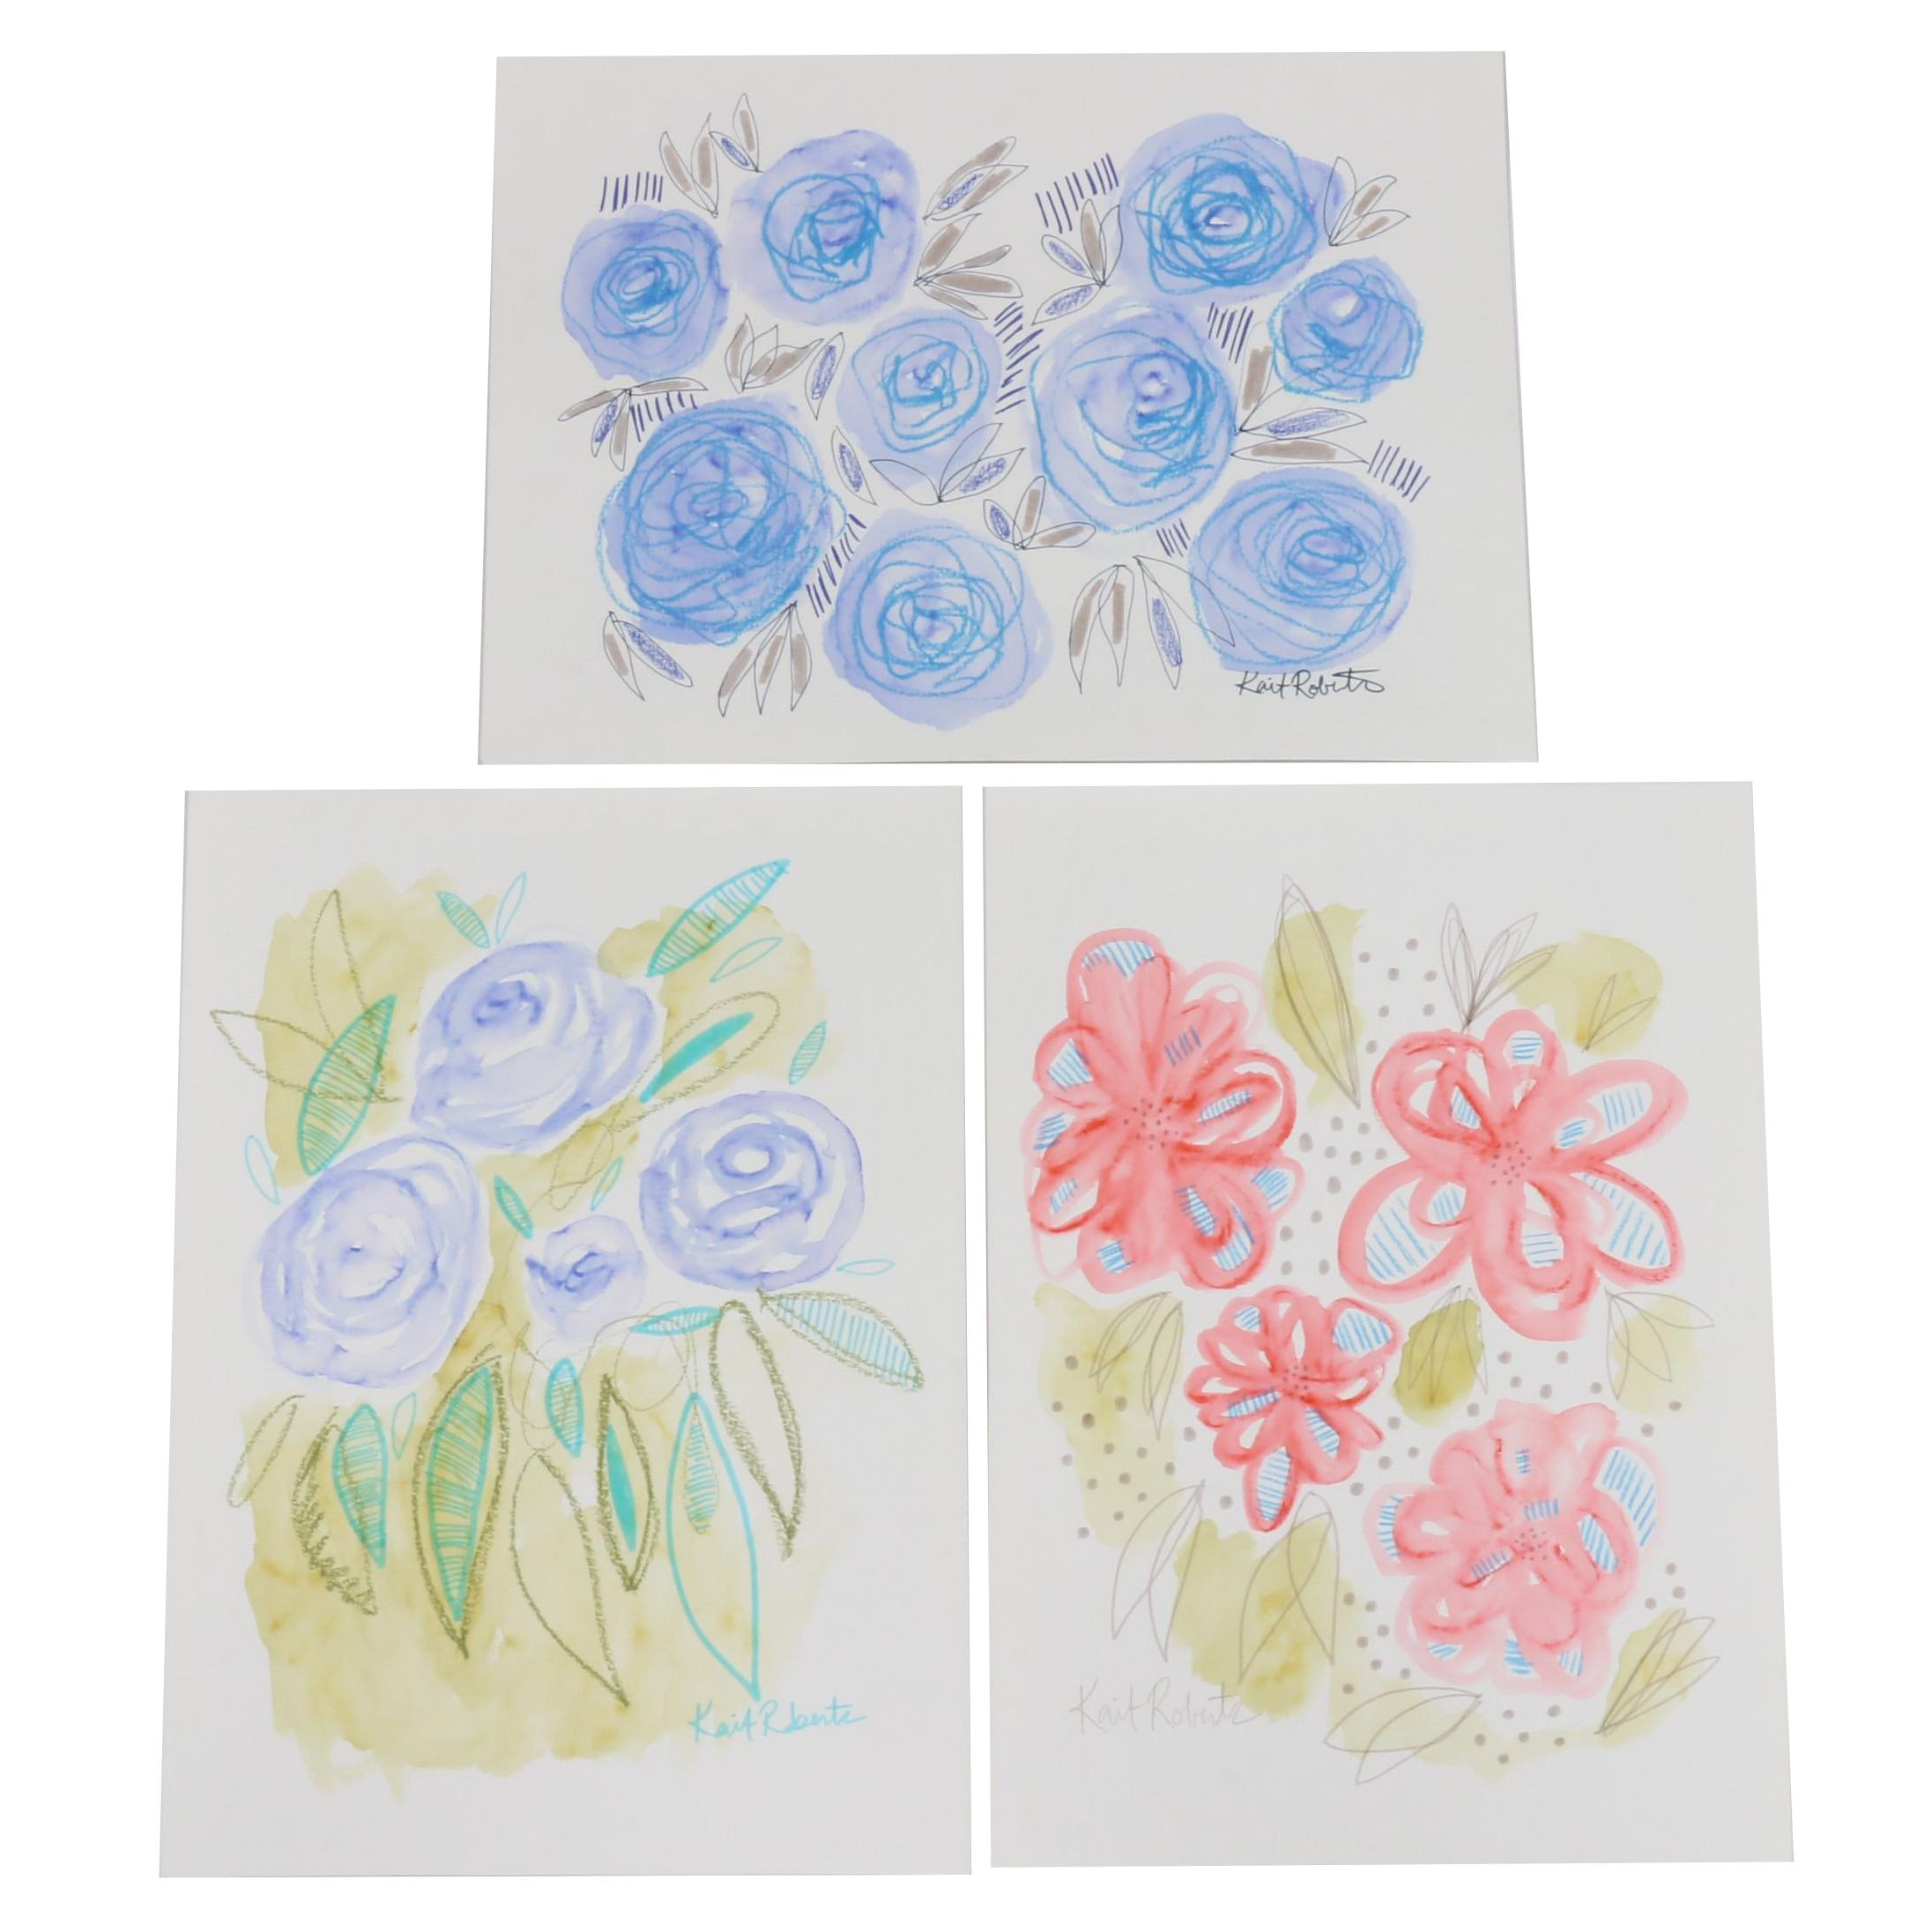 Kait Roberts Floral Watercolor Paintings